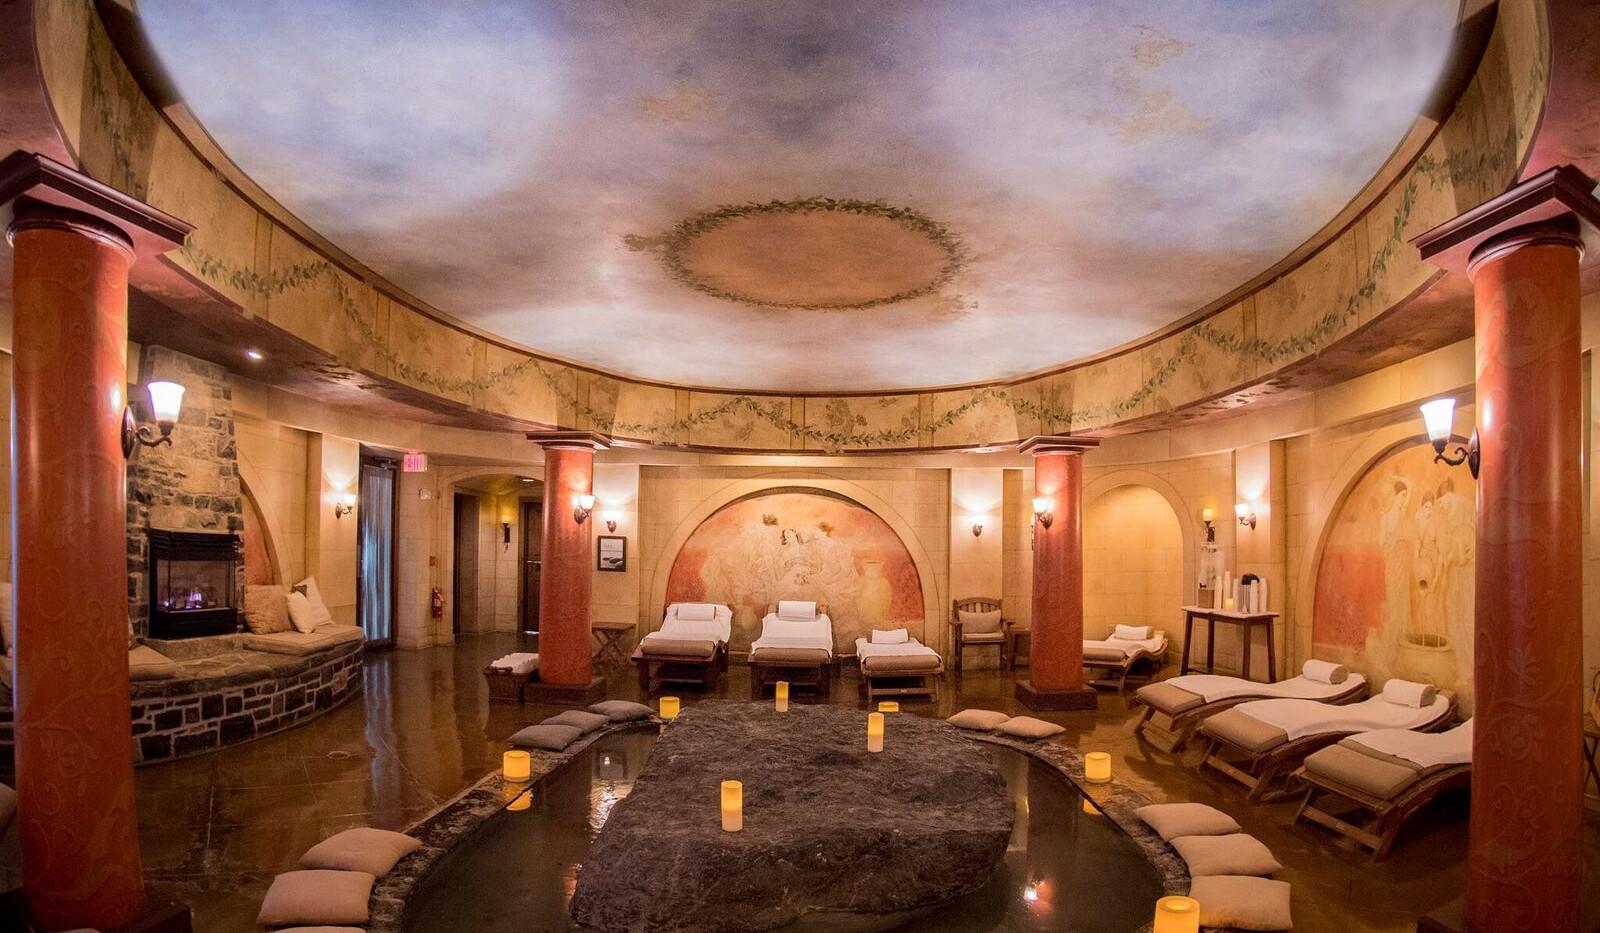 Resting Area Fireplace Mirbeau Inn & Spa _Ramsgard